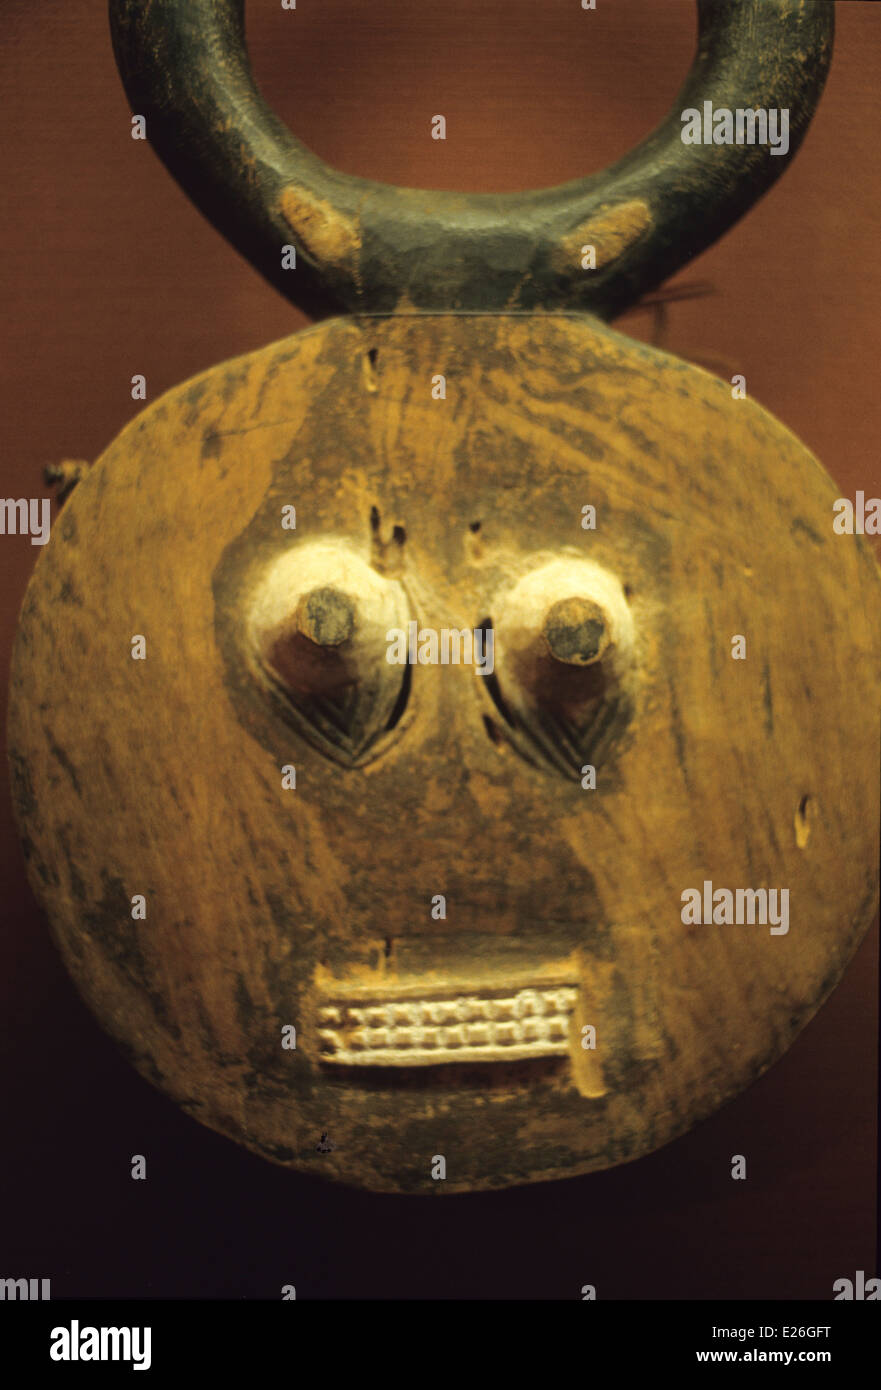 mask of the Ivory Coast,African and Oceanic Art Museum,Musée du quai Branly,Paris - Stock Image